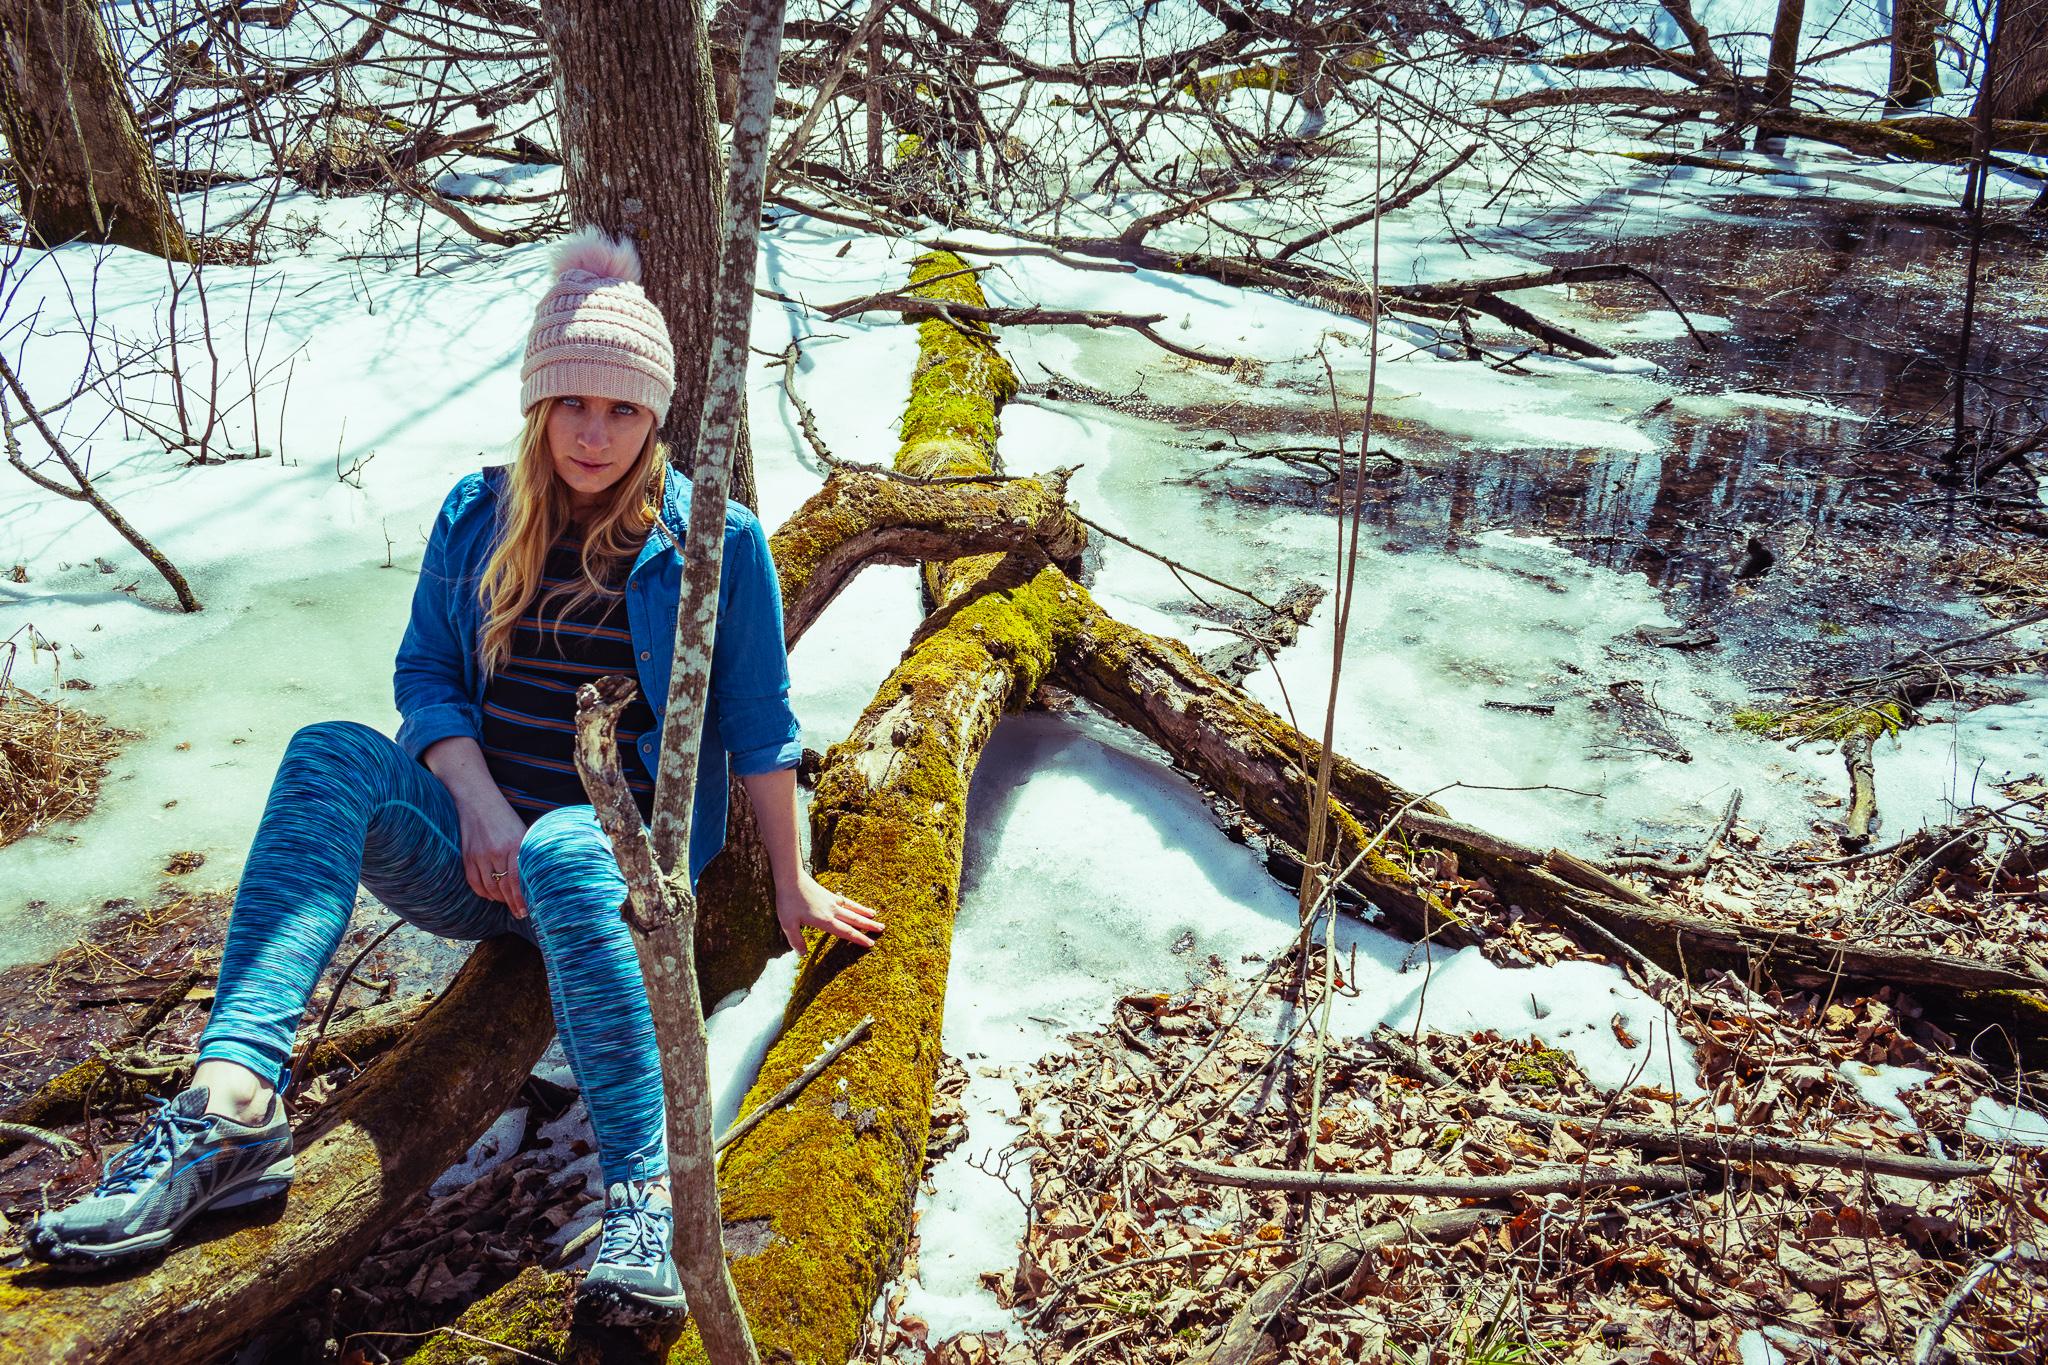 uprooted-traveler-nerstrand-big-woods-state-park-hiking-minneapolis-st-paul.jpg